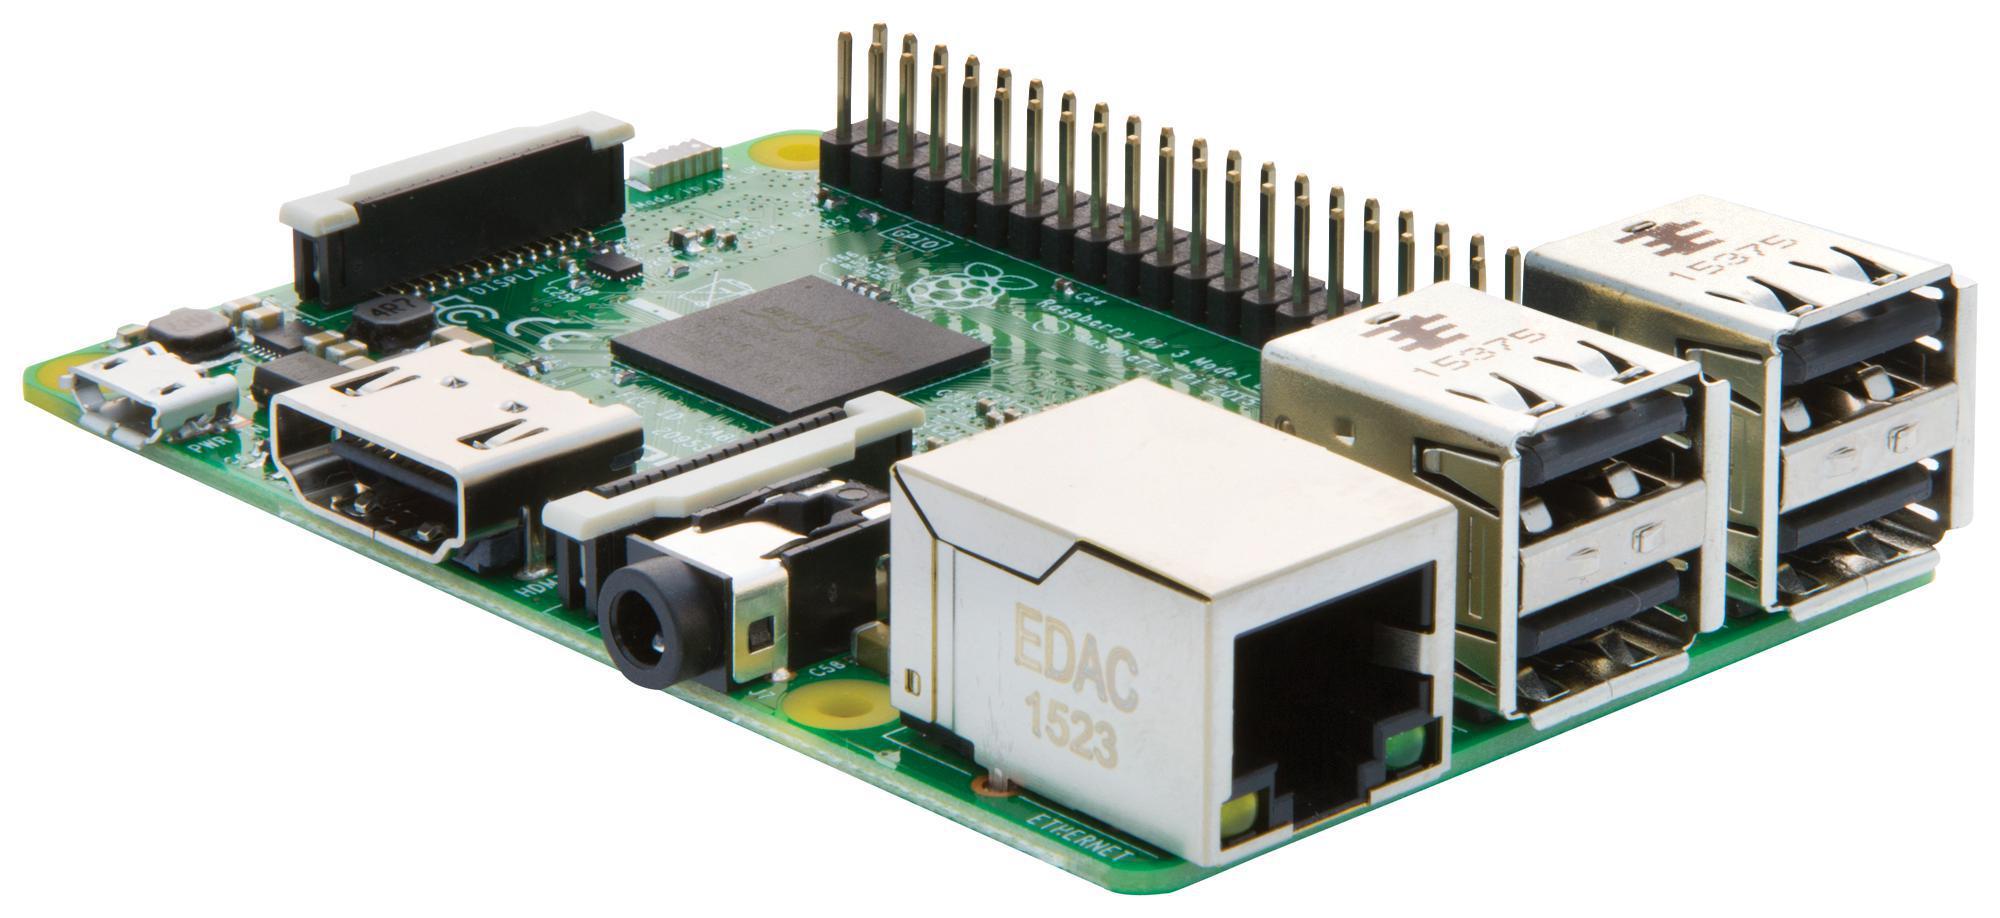 Raspberry Pi 3 Architecture Of Ucreate Raspberry Pi 3 Kit Raspberry Pi 3 16gb Microsd